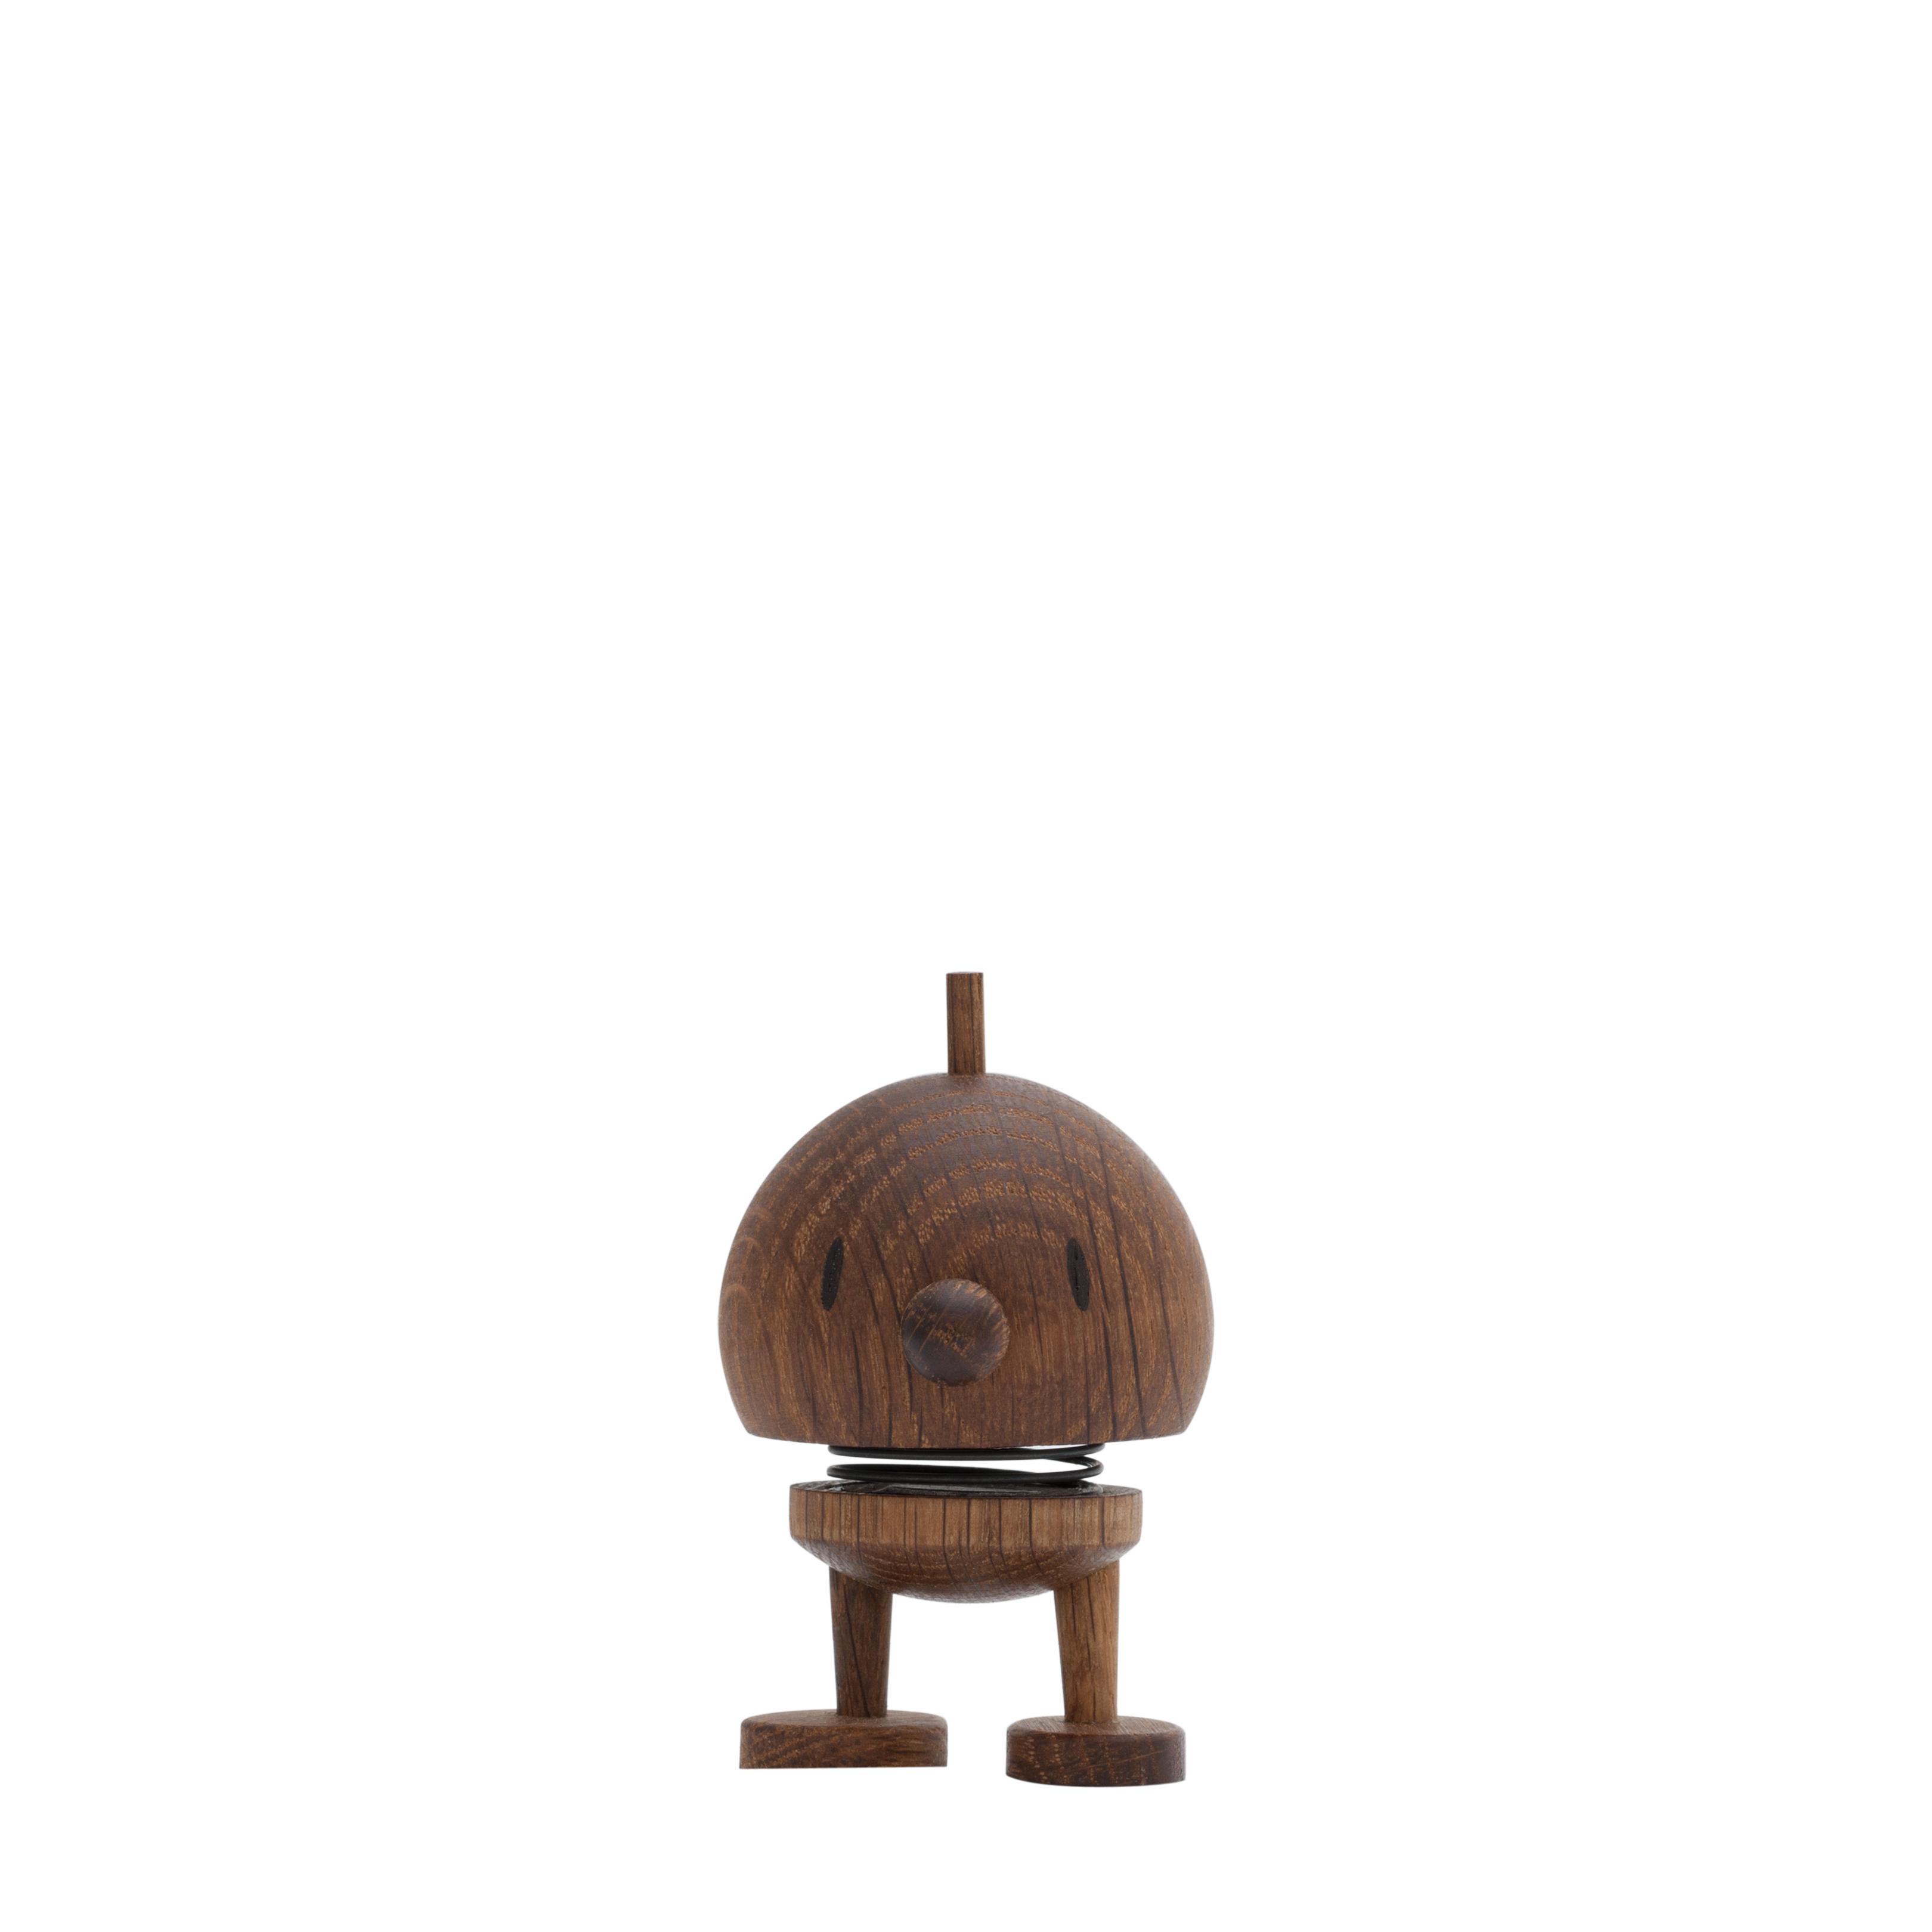 Hoptimist - Baby Woody Bumble - Räuchereiche